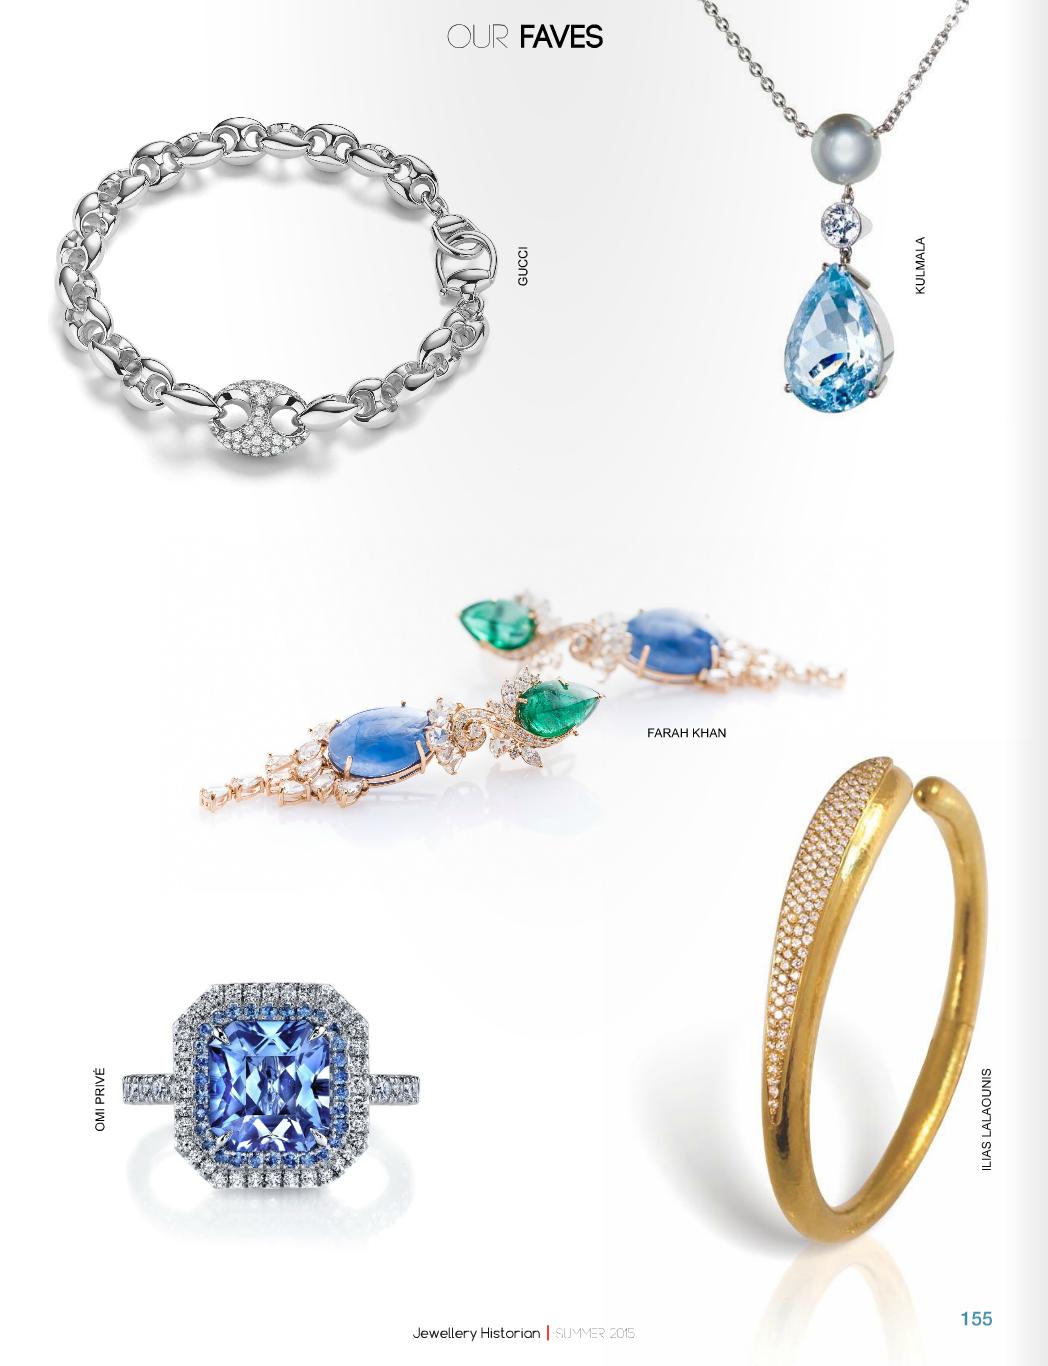 Jewellery Historian #12 | OUR FAVES | Kulmala ring | www.jewelleryhistorian.com